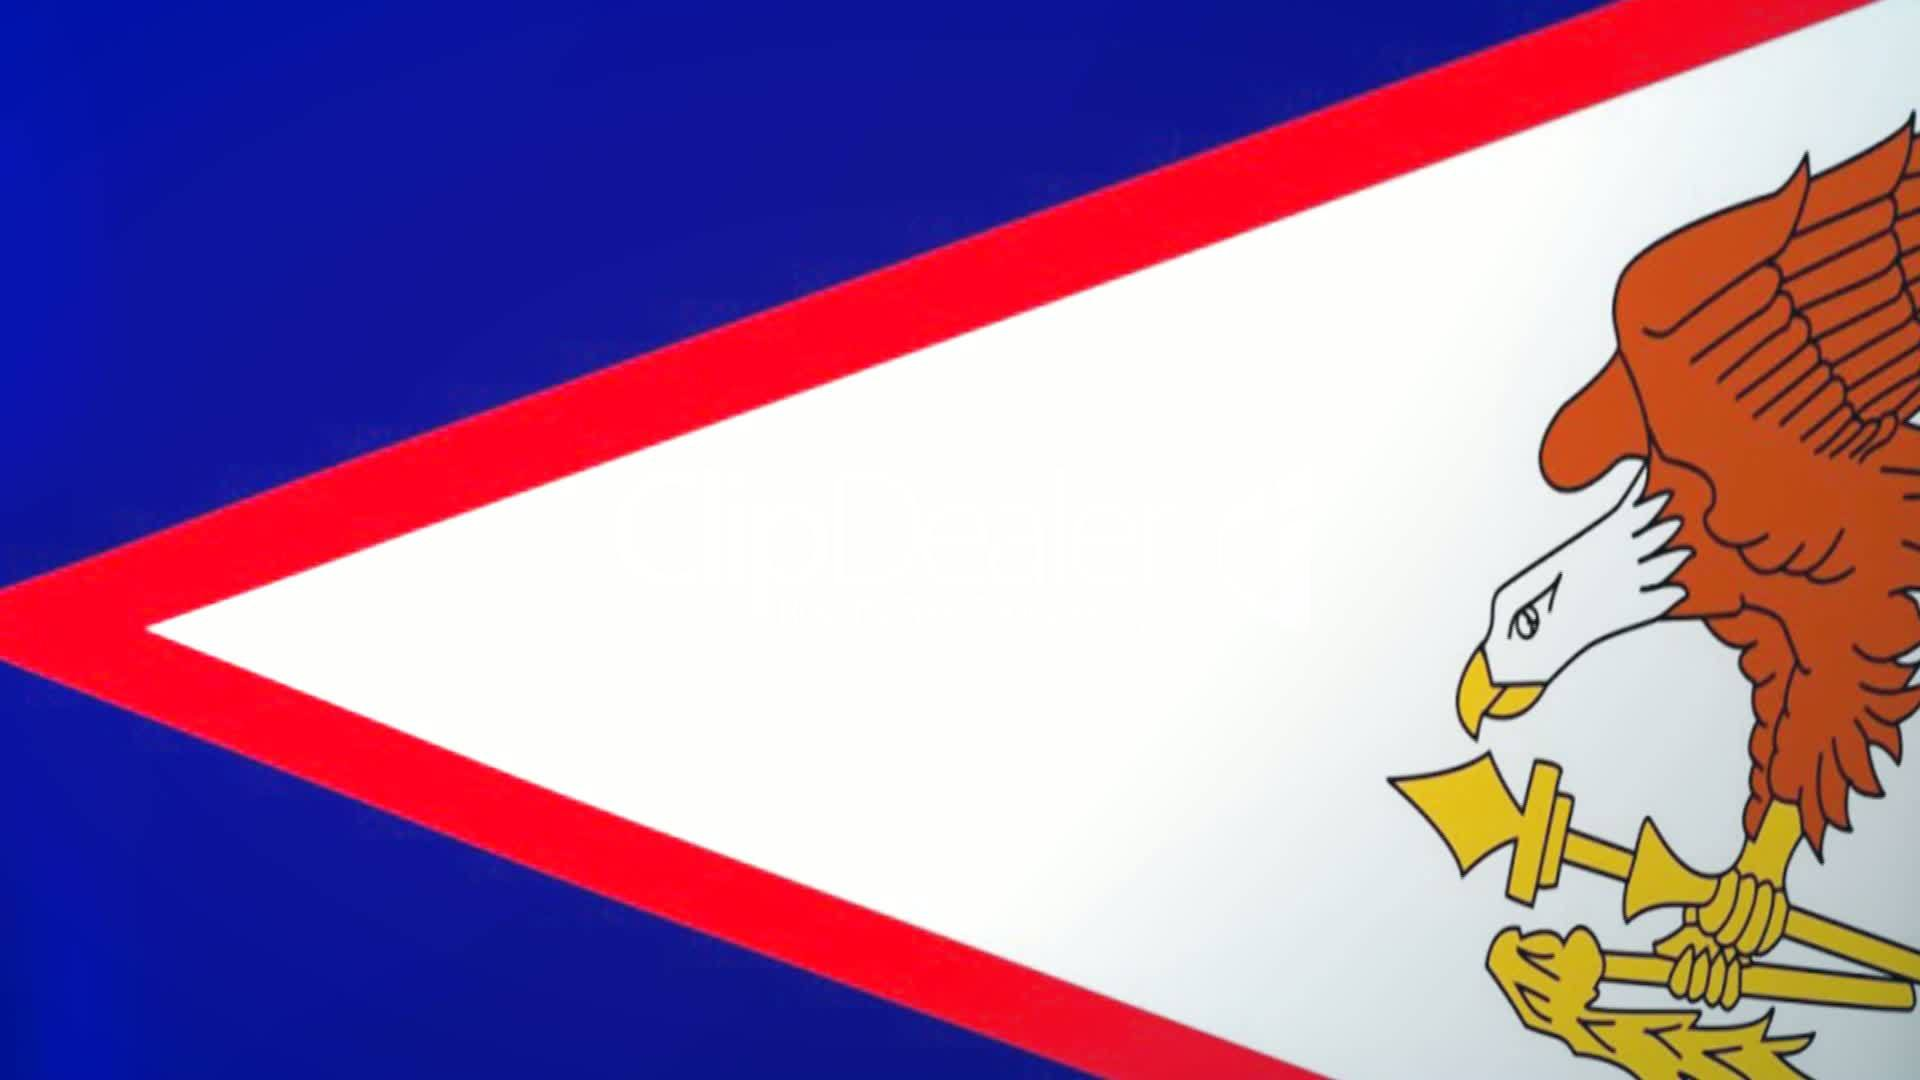 American Samoa Waving Flag Royaltyfree video and stock footage